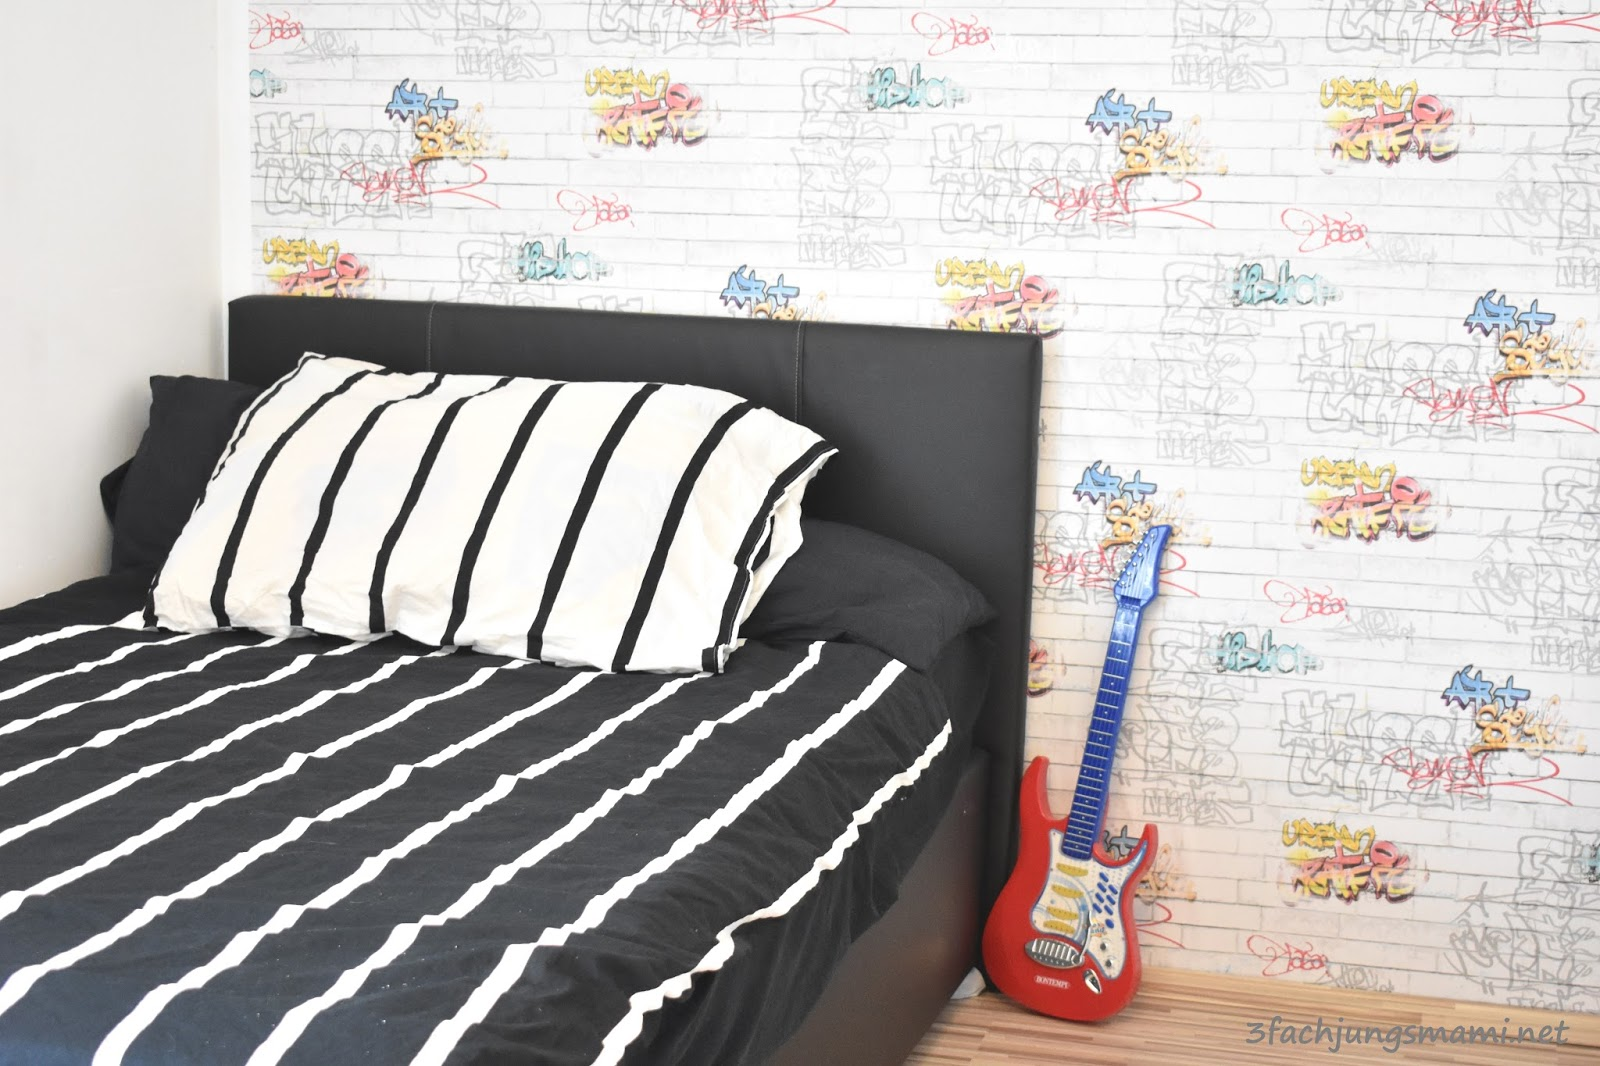 Roomtour: Christophers neues Kinderzimmer - 3-fach Jungsmami